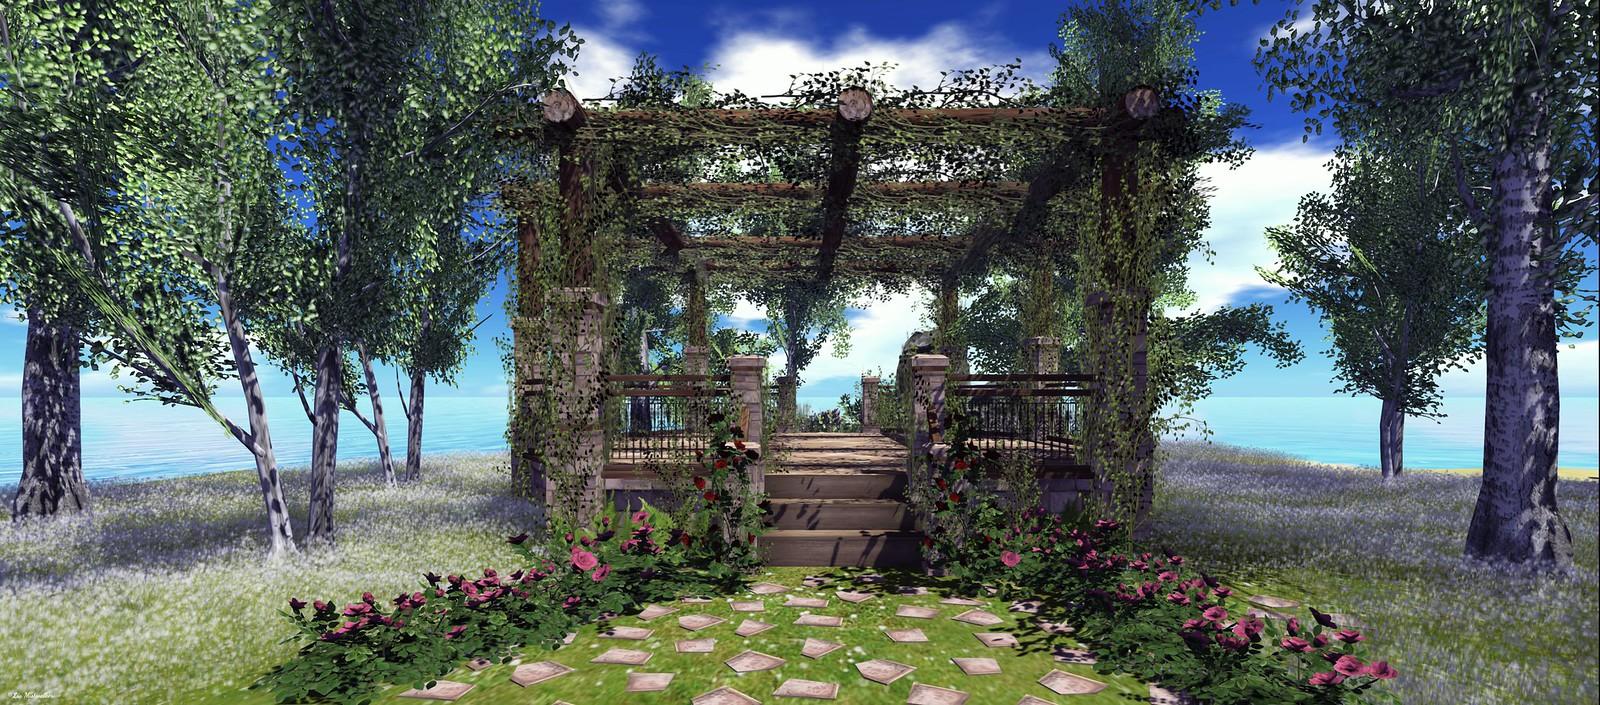 Home & Garden Therapy # 317